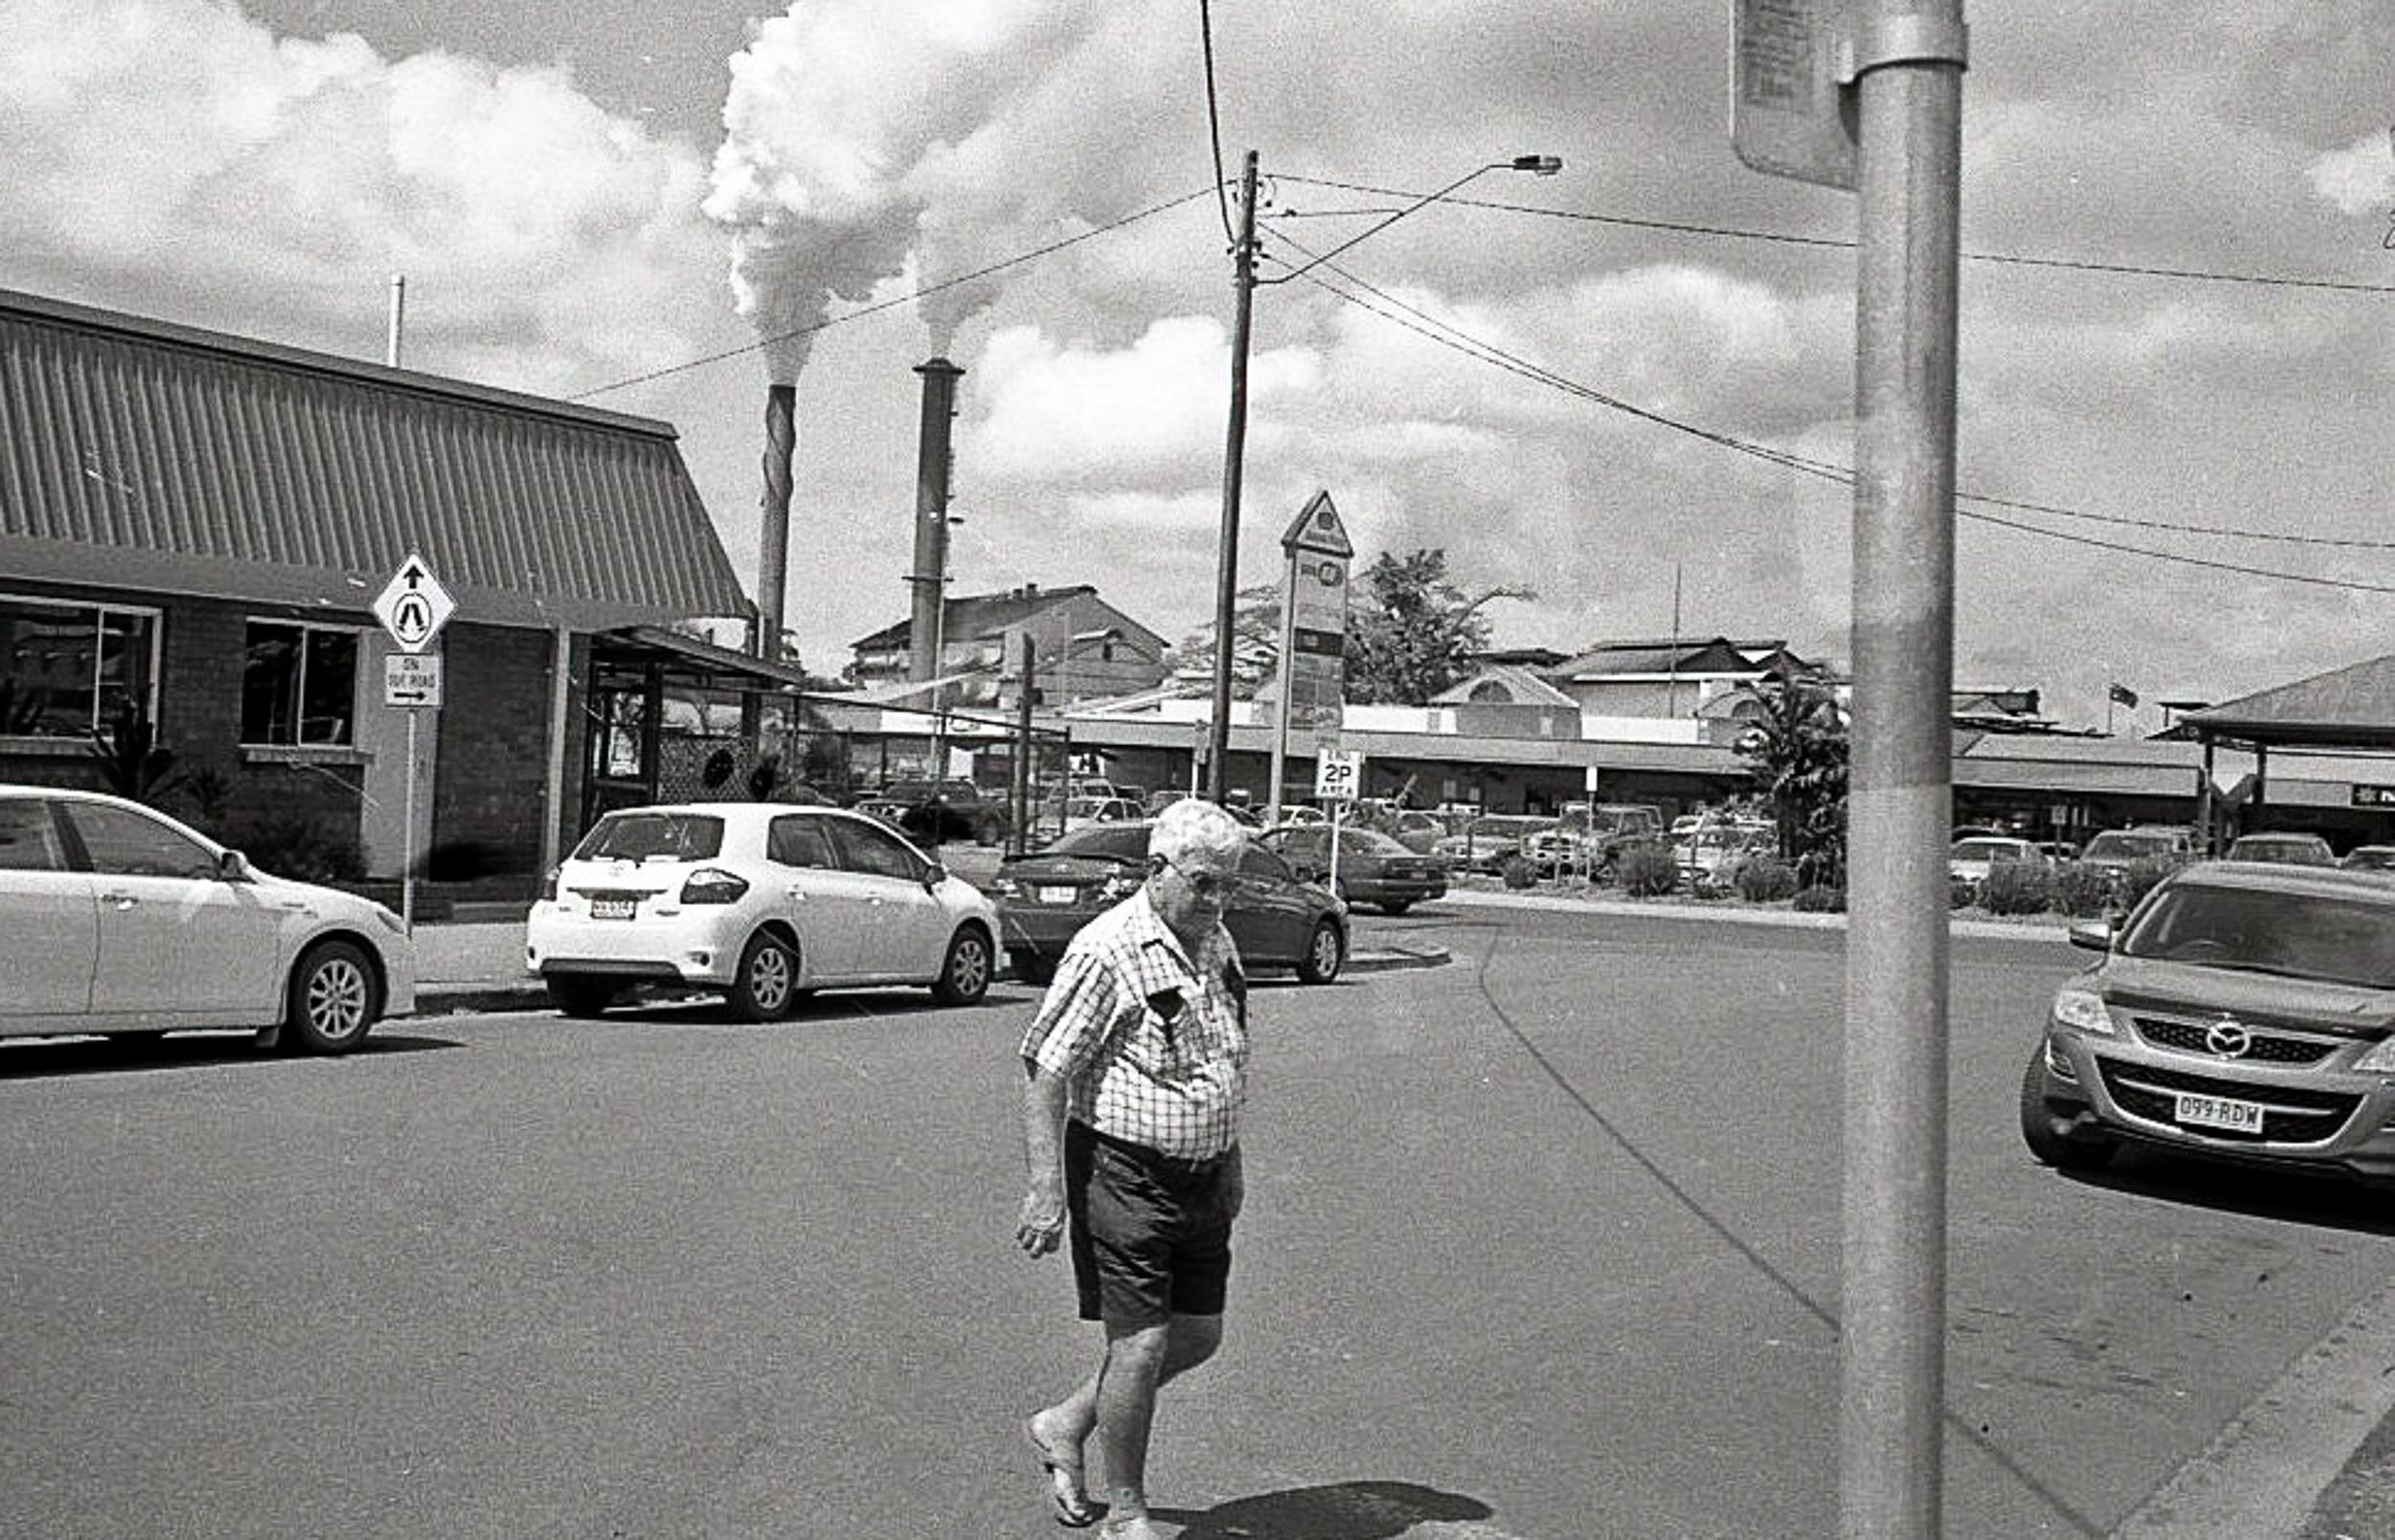 A older man crosses the road